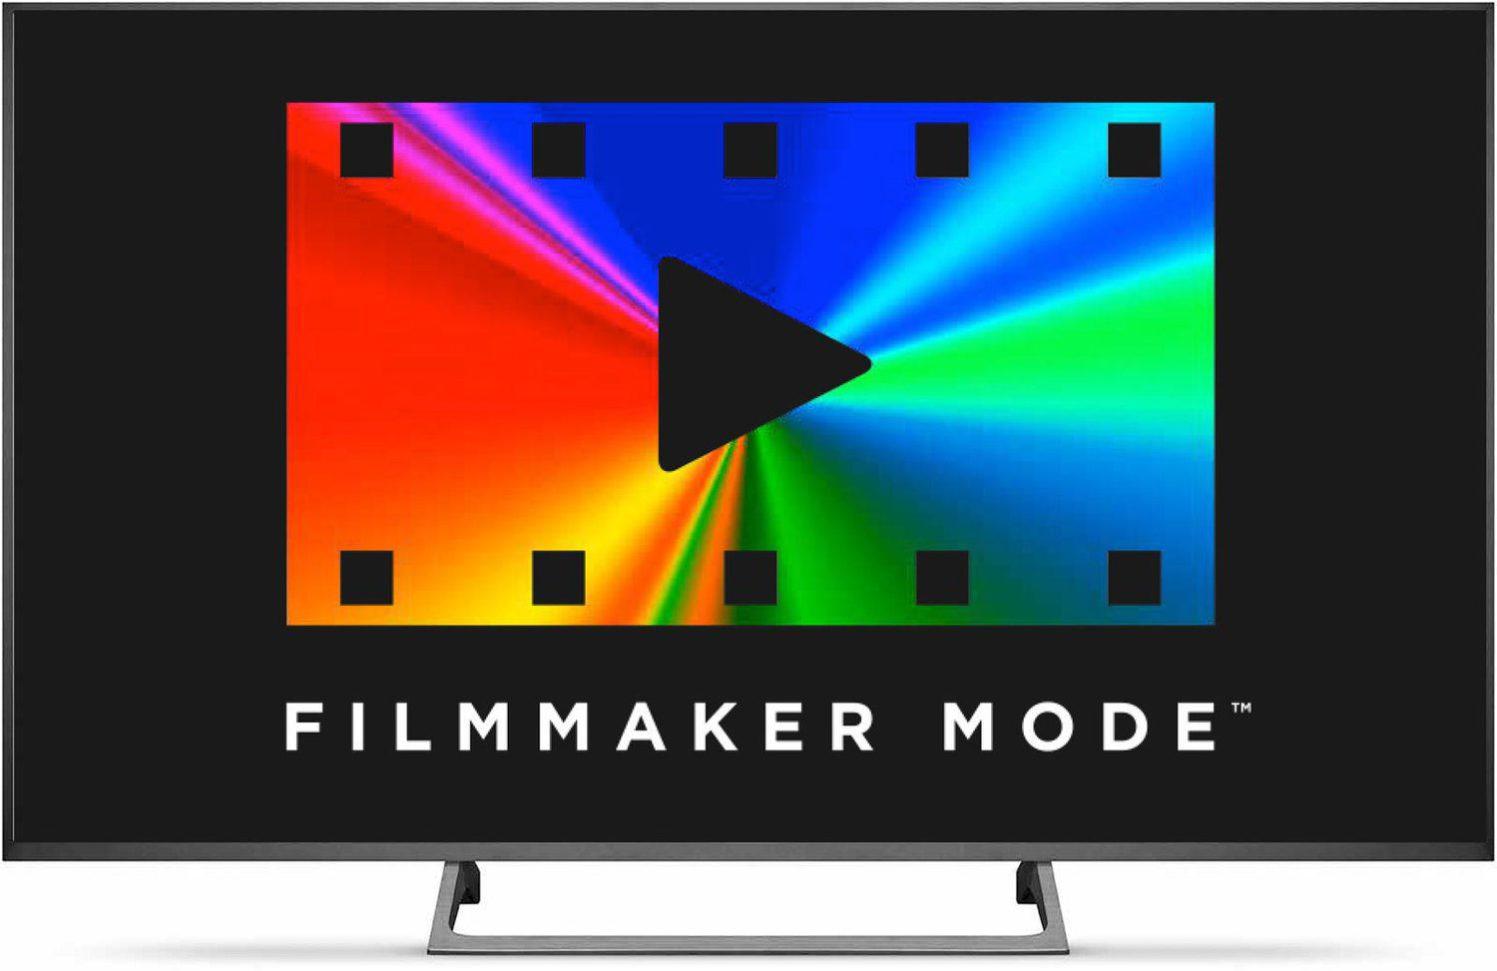 Samsung KU6300 Review – 4K Ultra HD TV - HDTVs and More